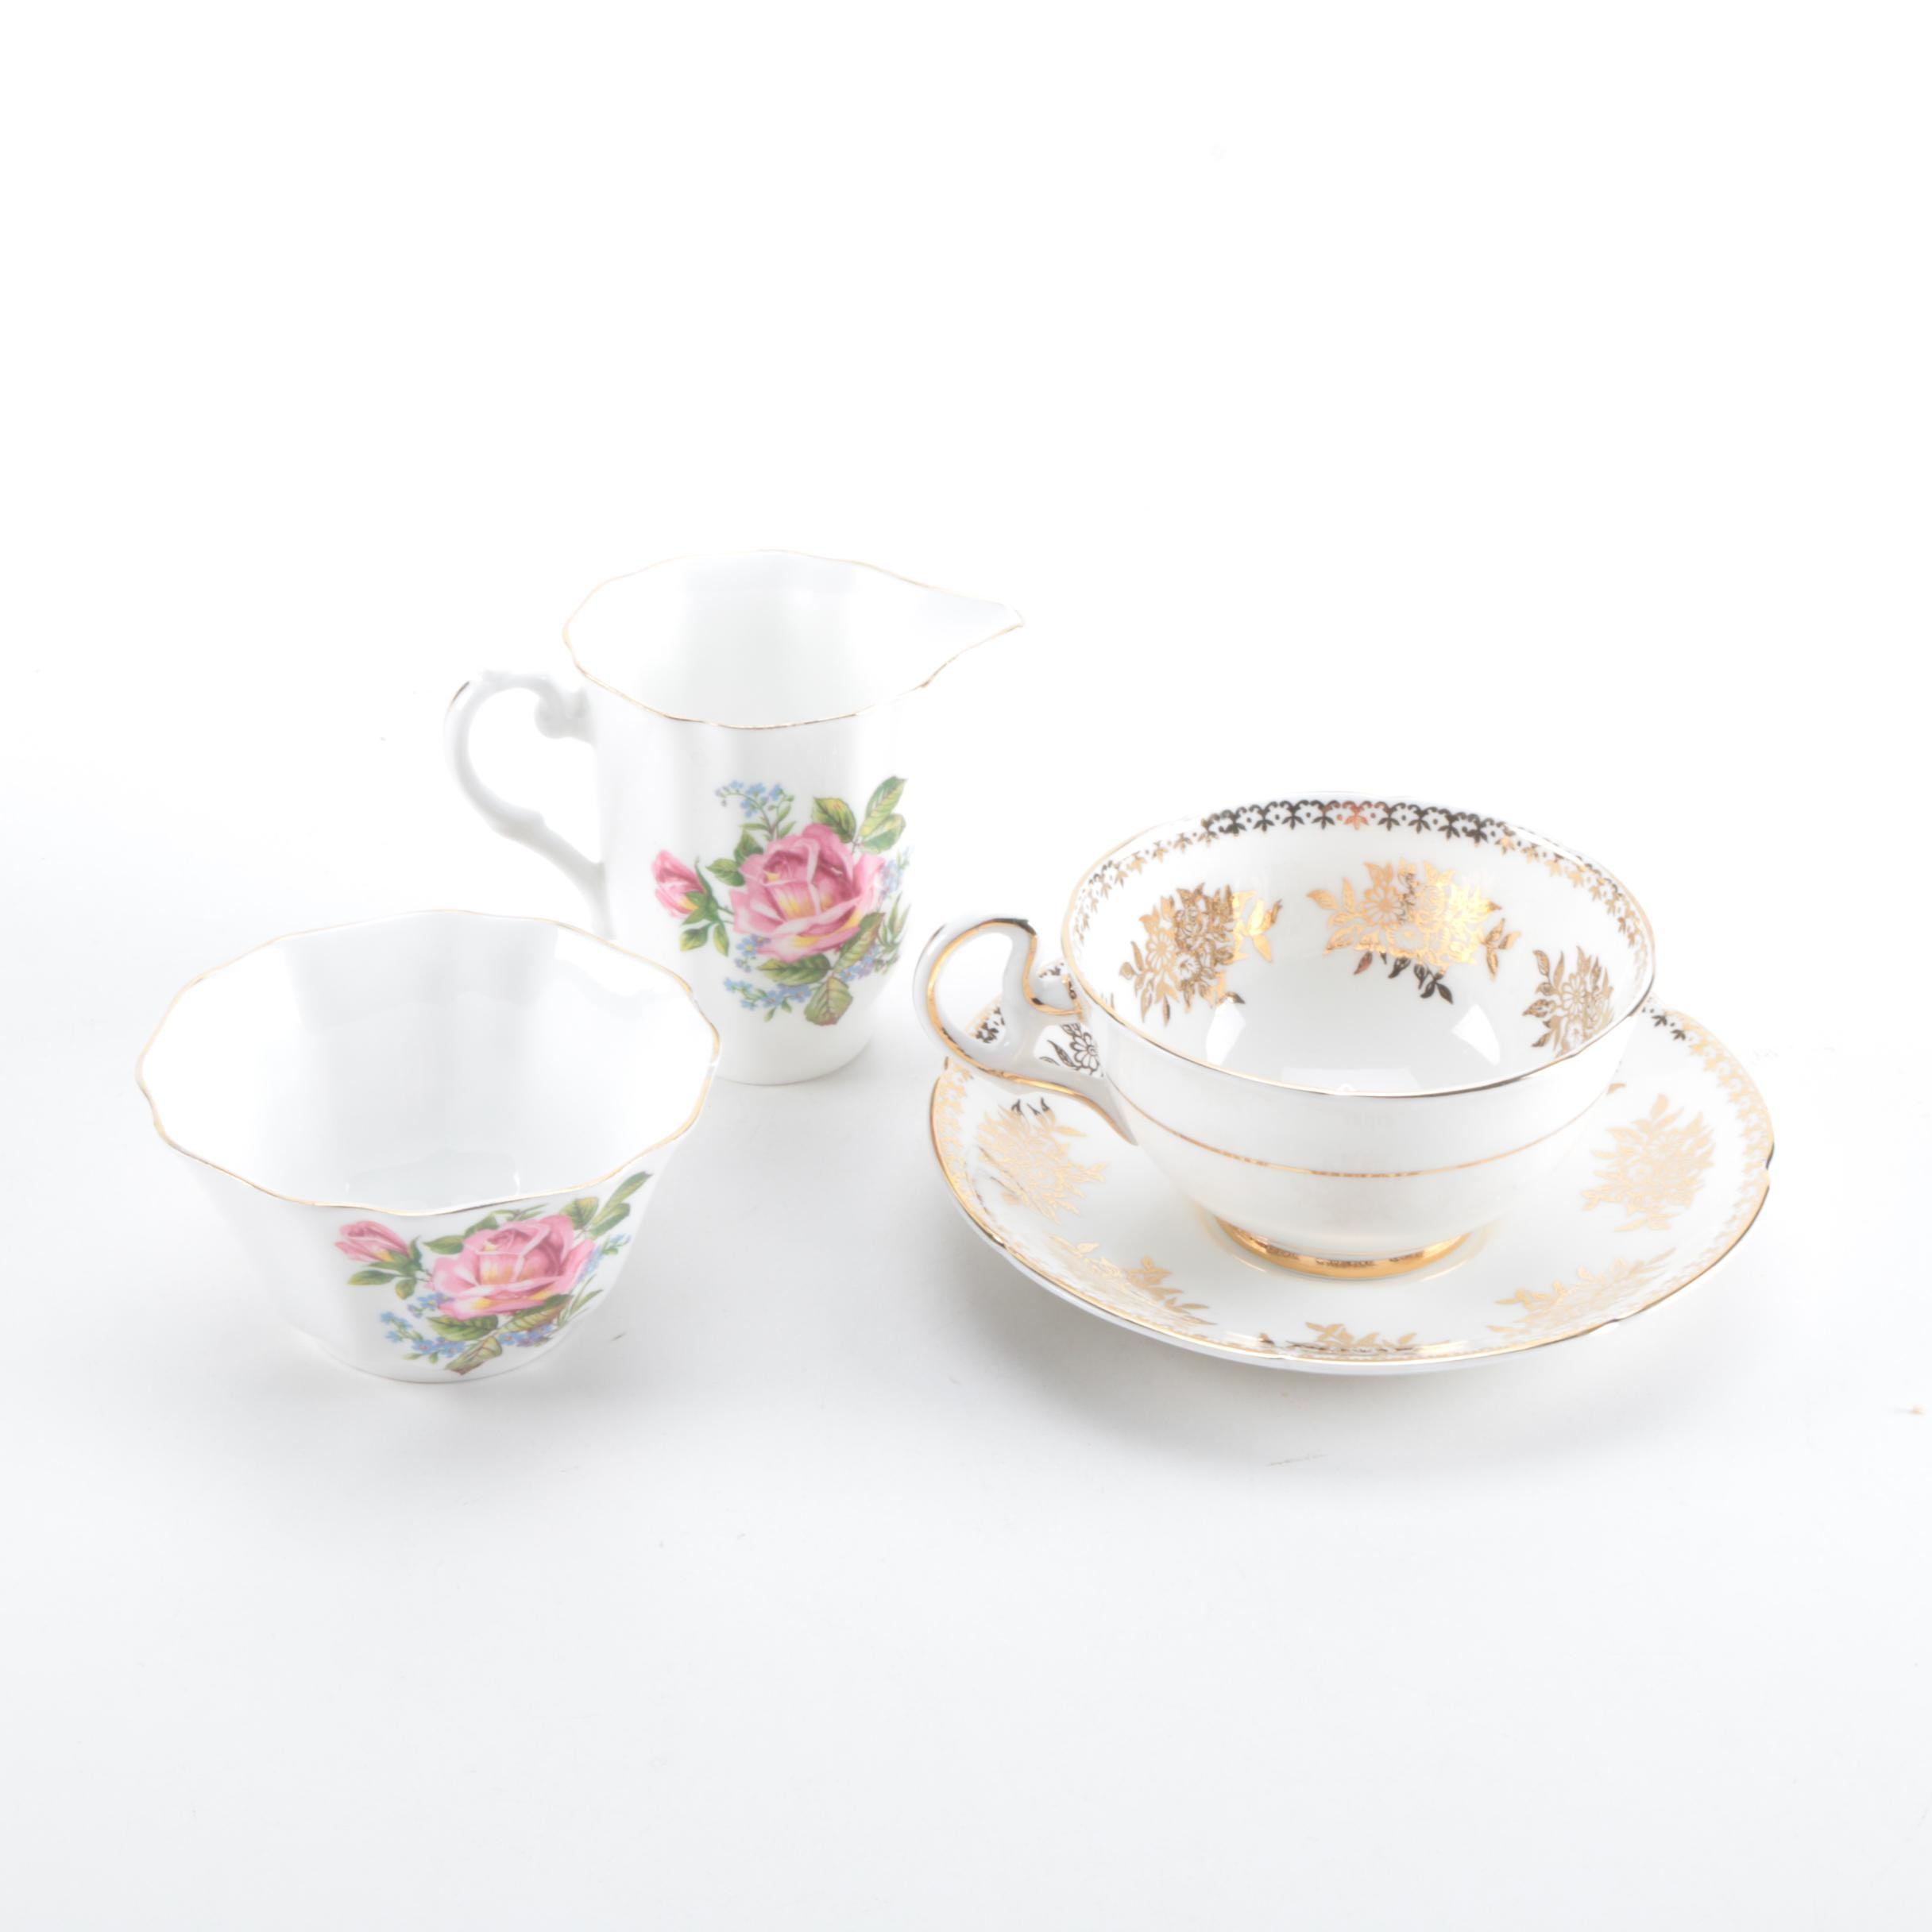 Royal Grafton Fine Bone China Teacup and Saucer